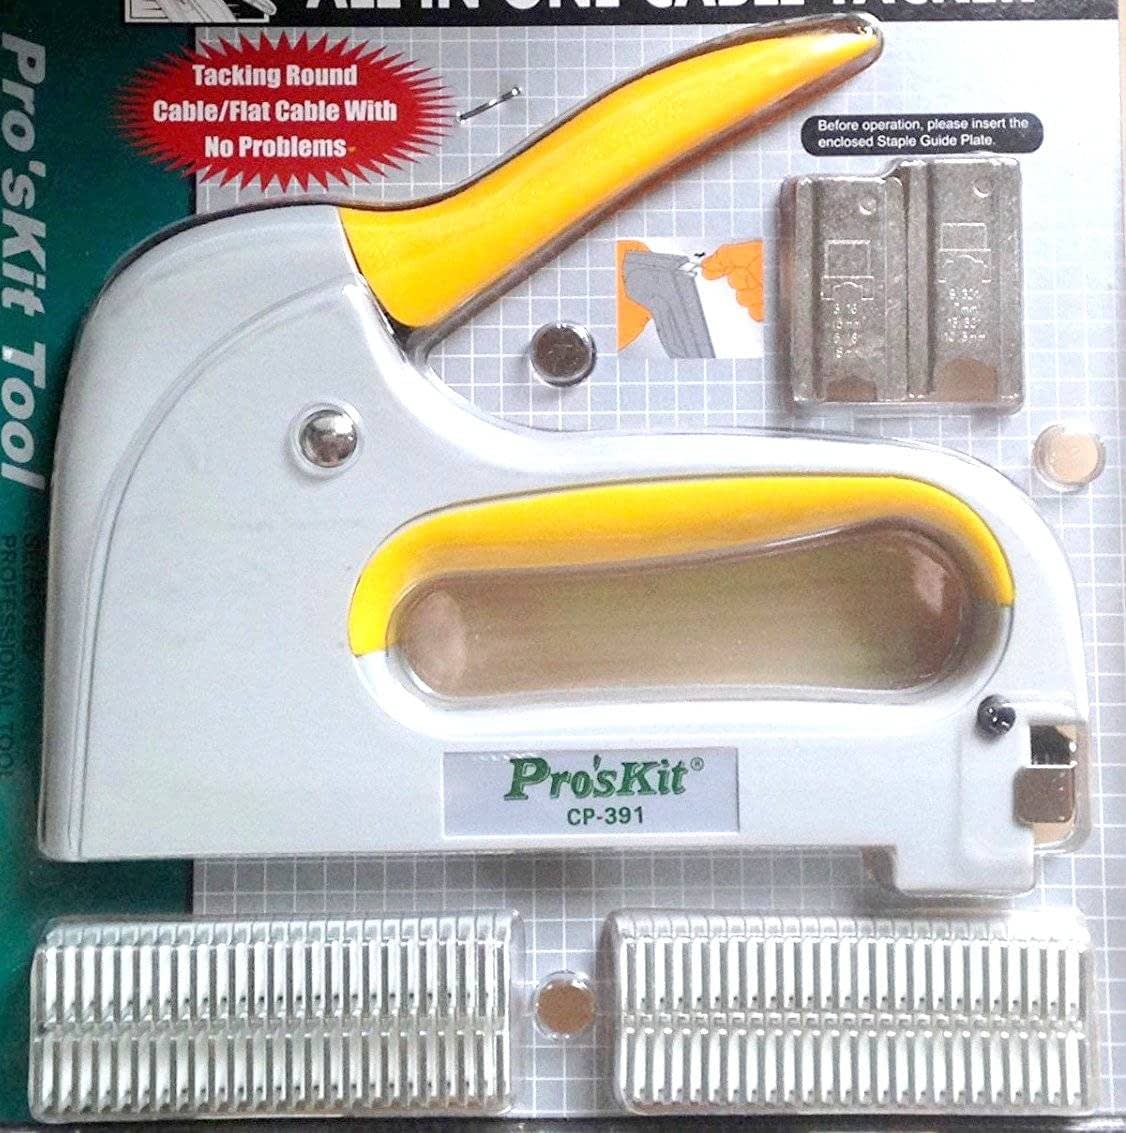 Grapadora profesional para cable ProsKit CP-391